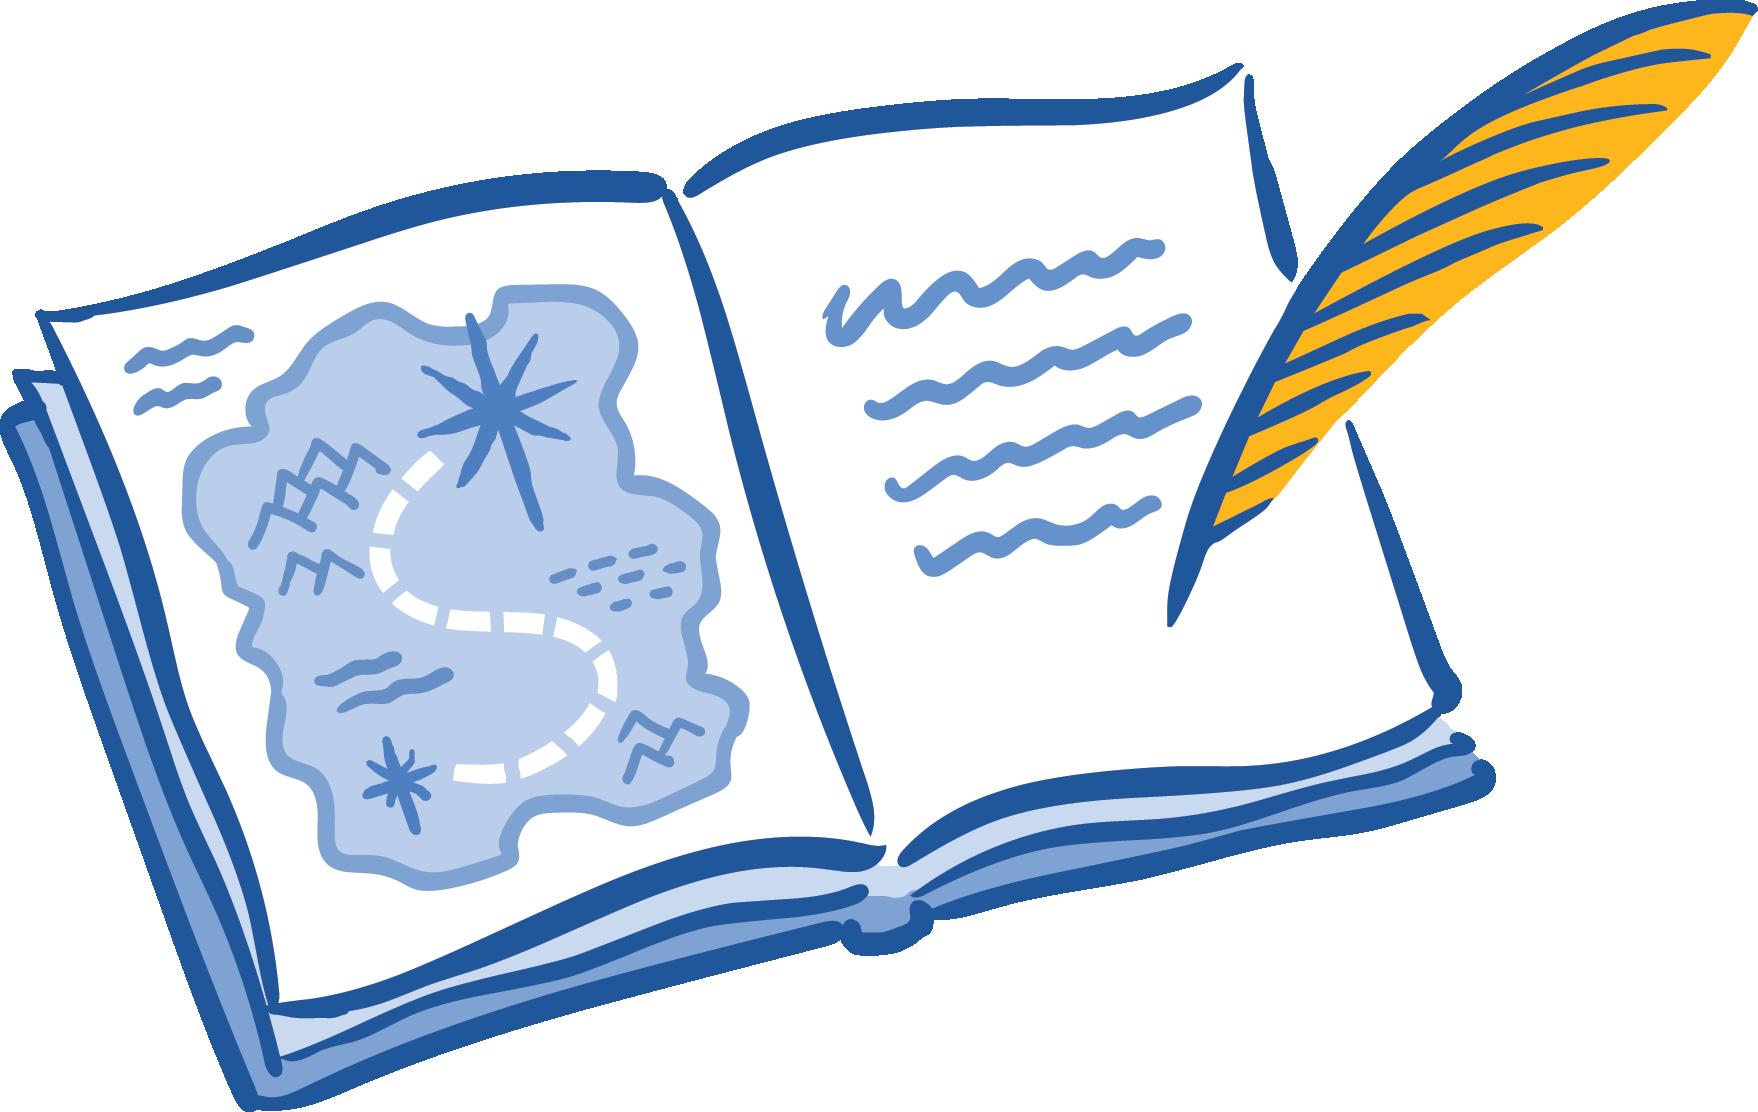 Storyline journal